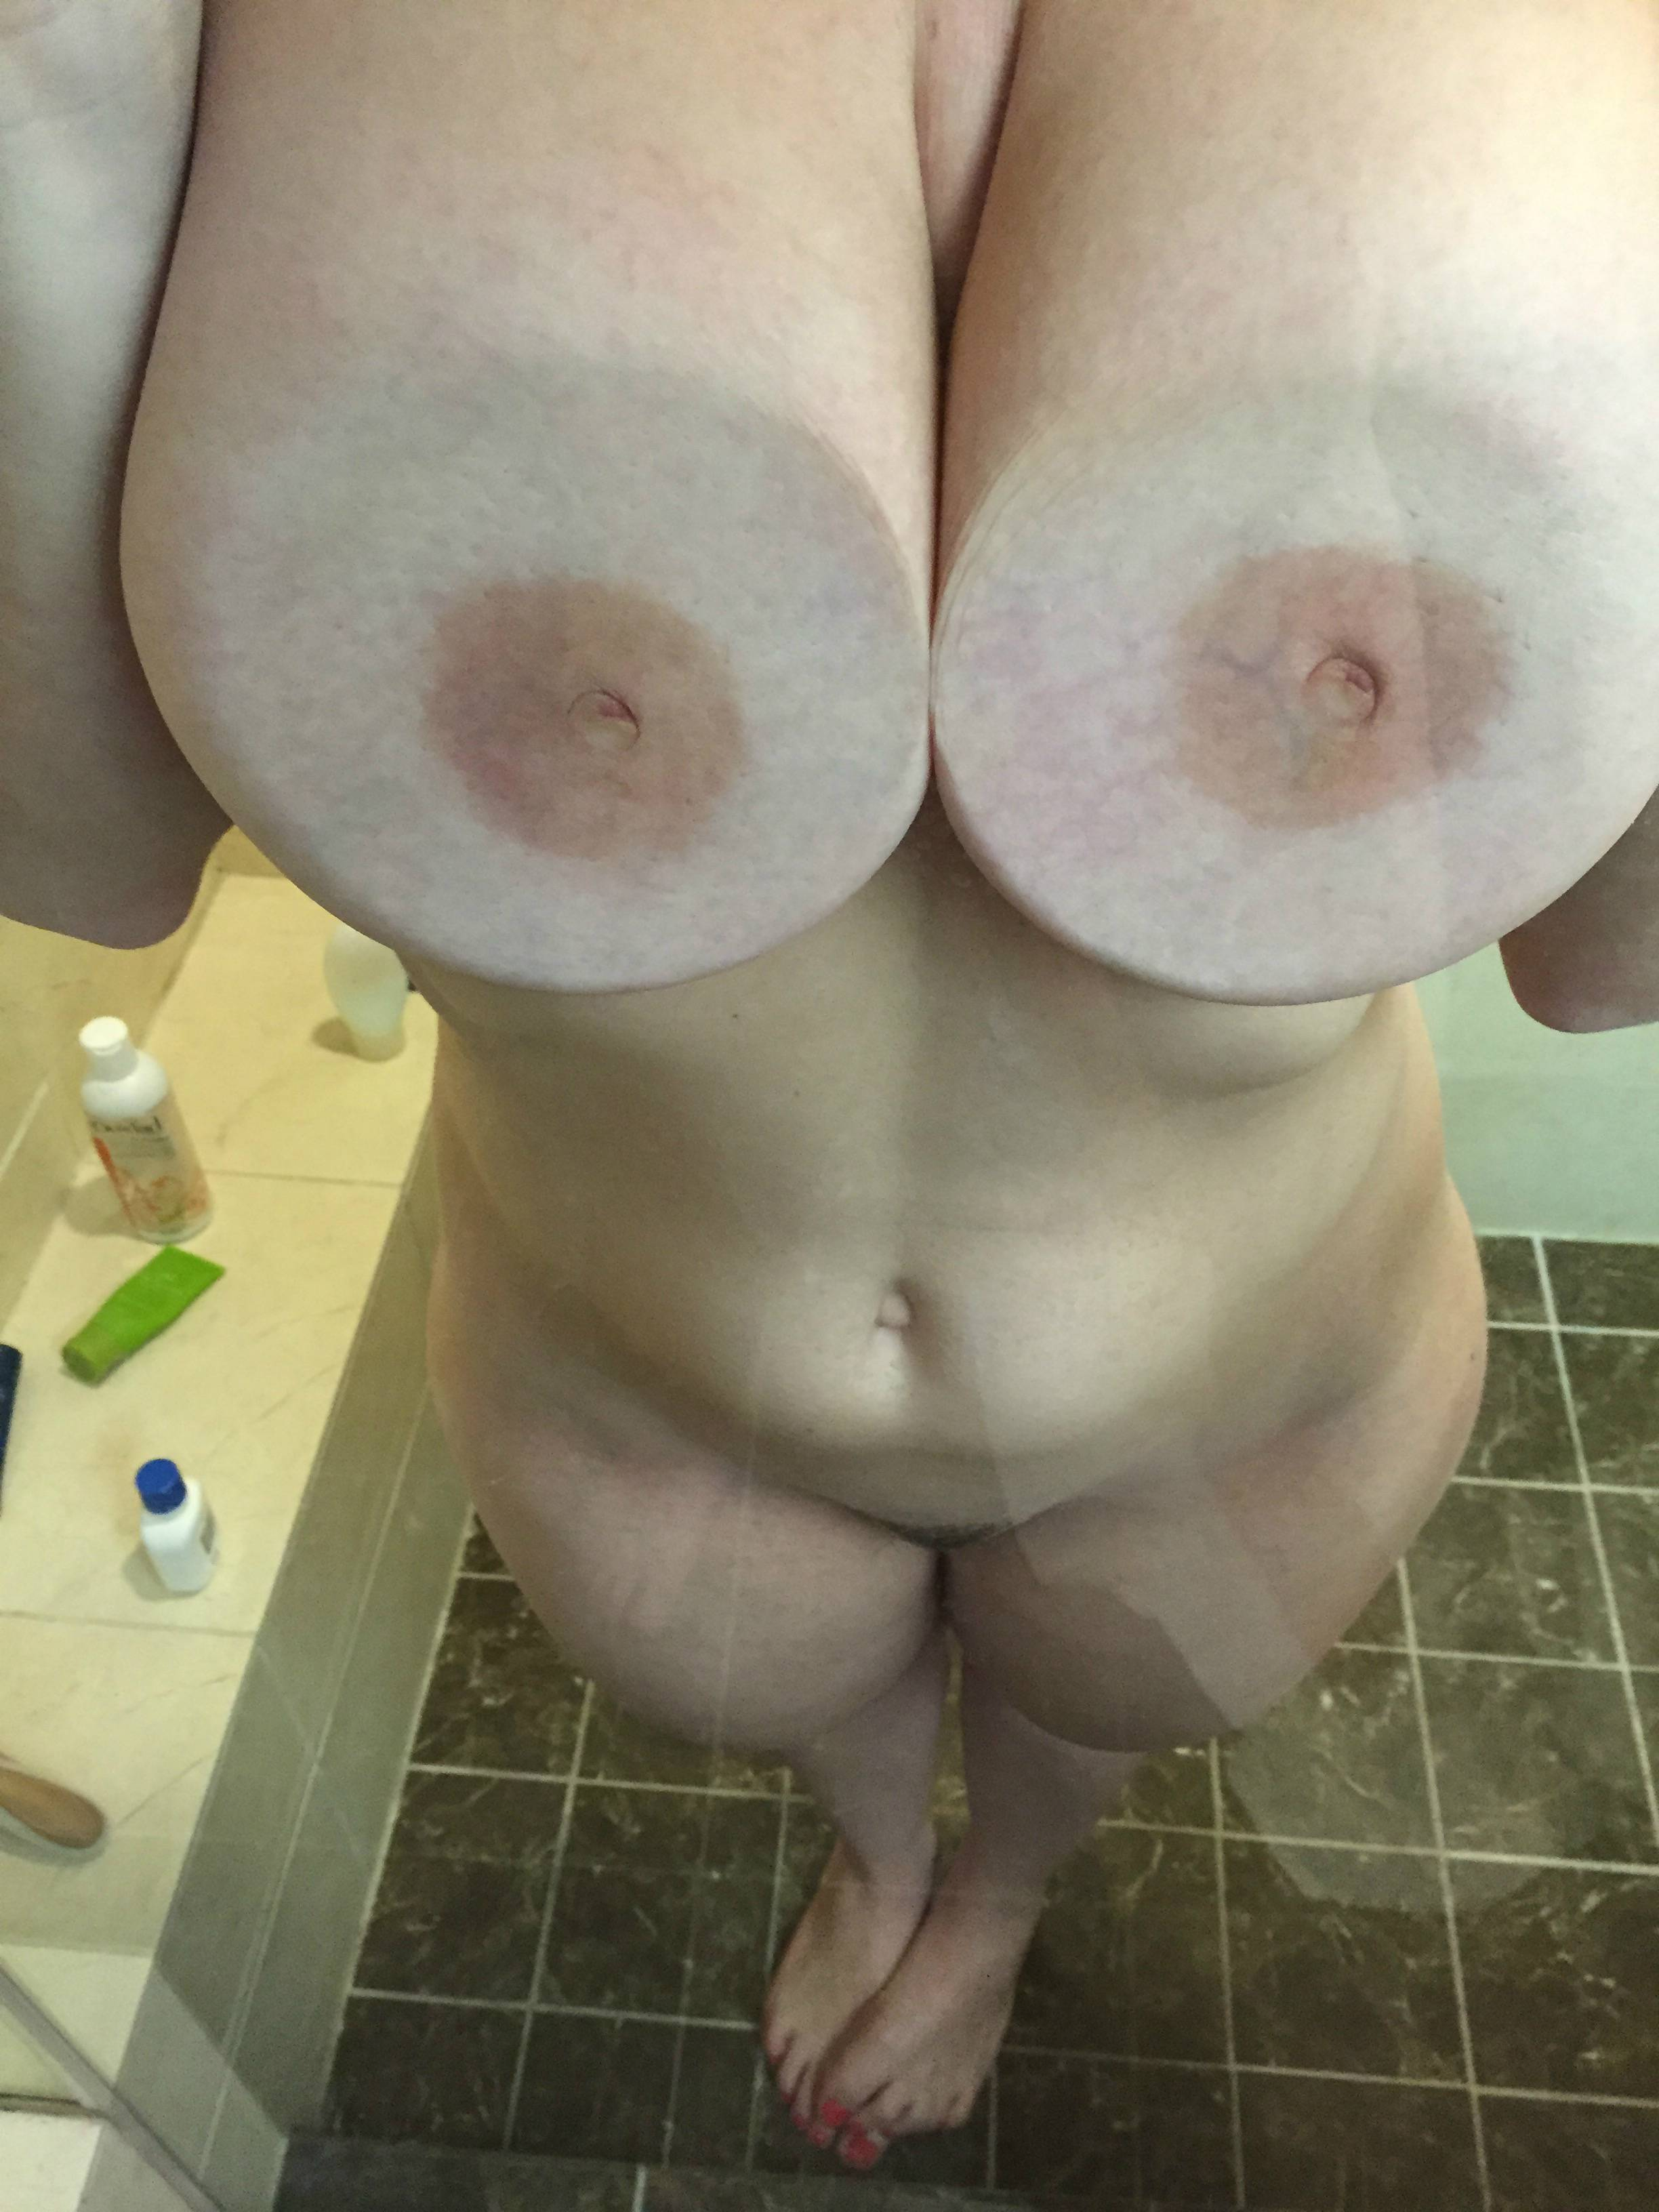 Mom Helps Stepson Shower